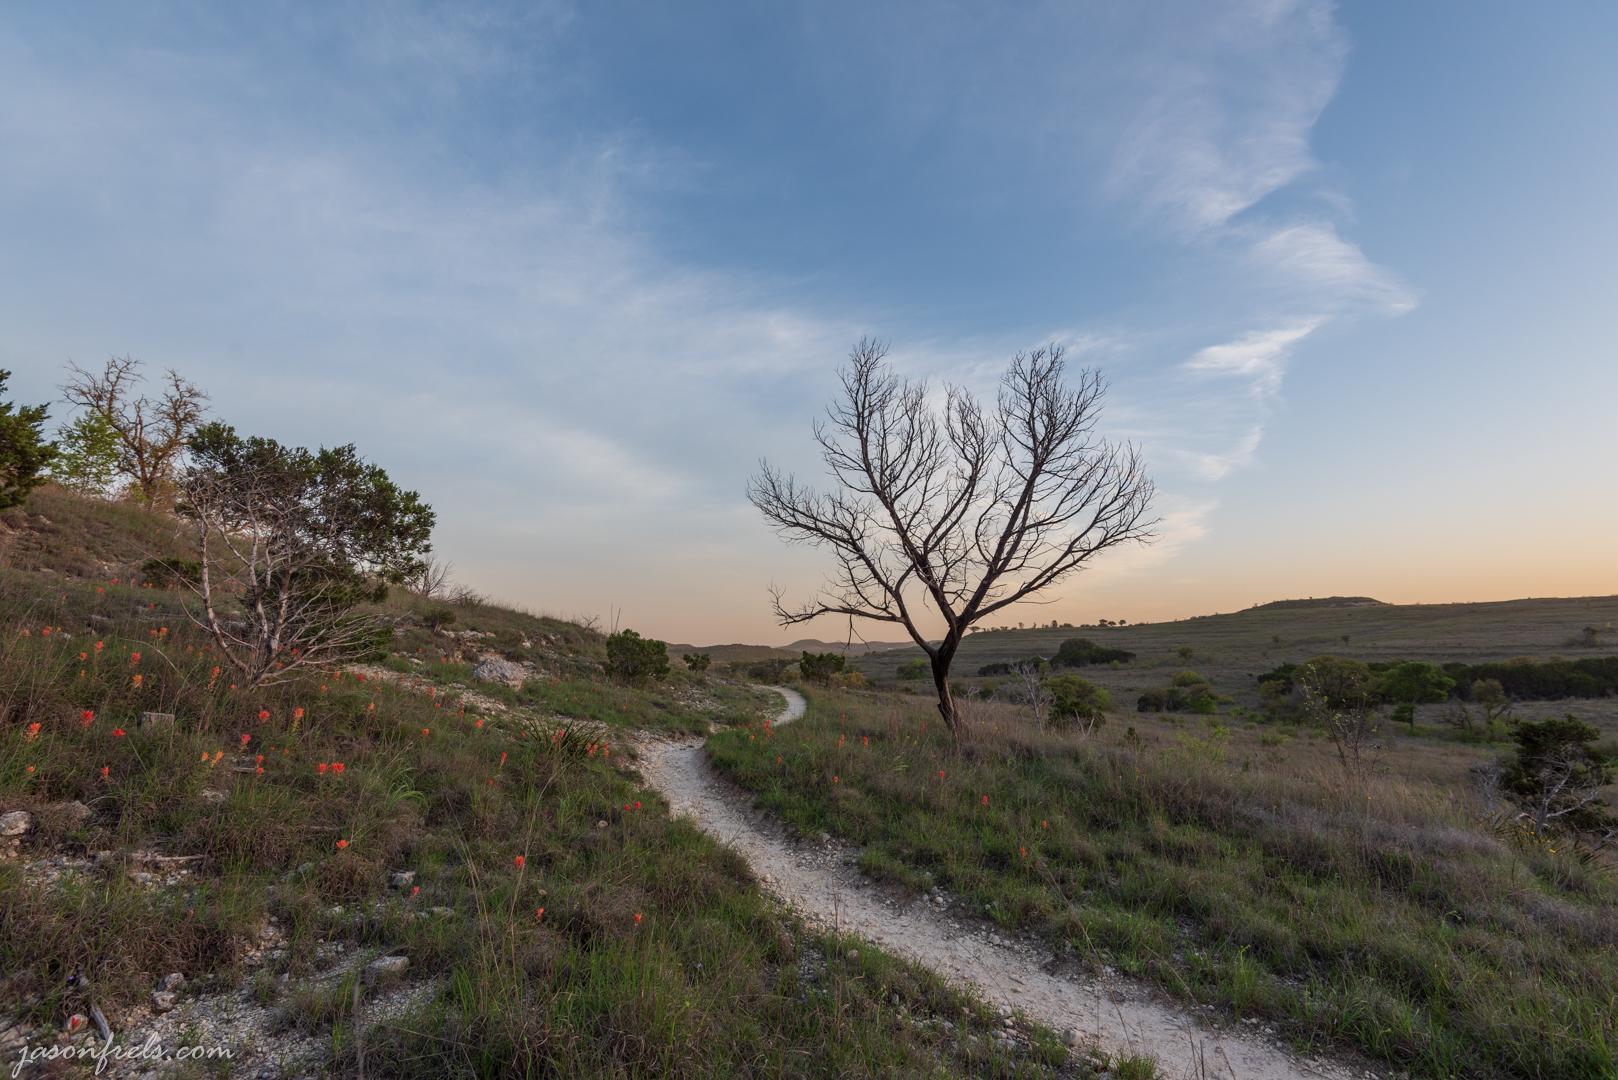 Hiking Trail at Balcones Canyonlands National Wildlife Refuge